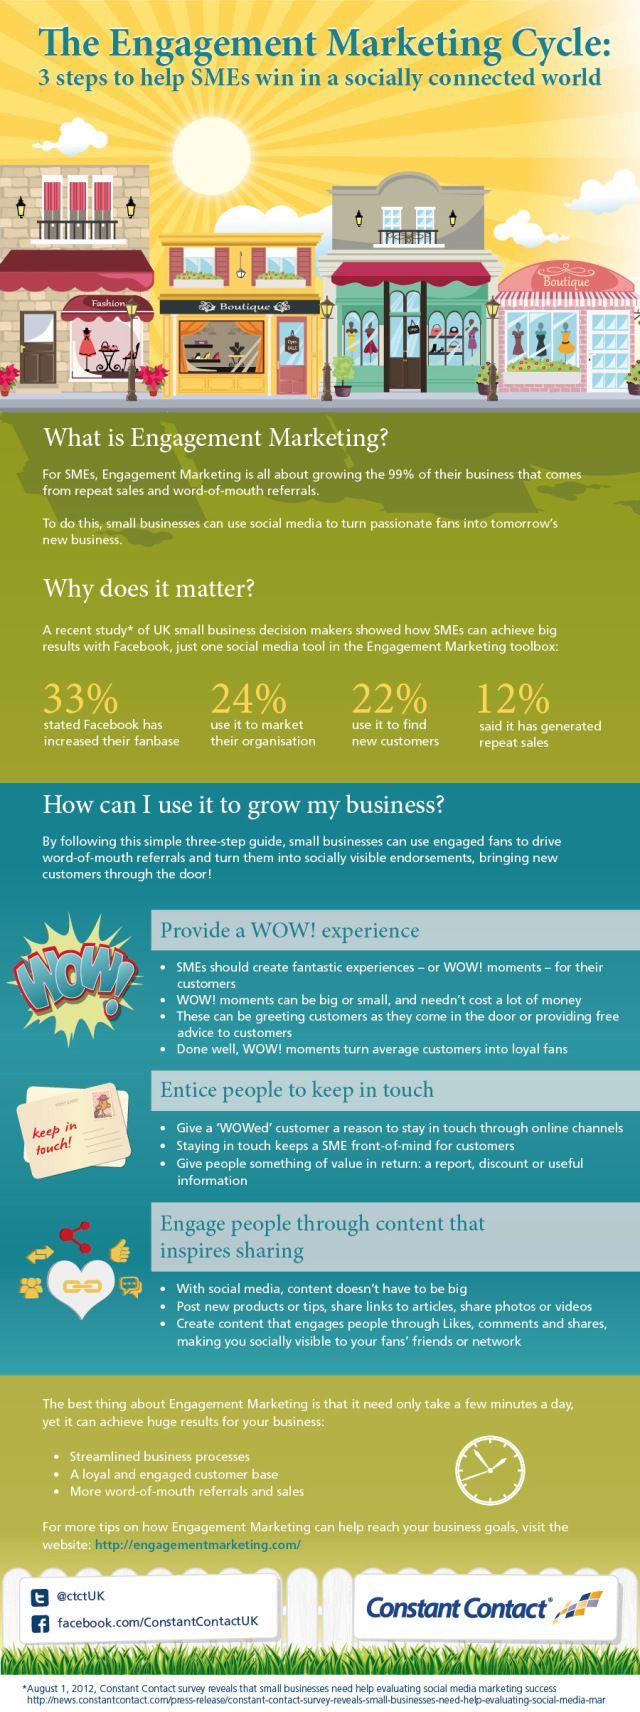 El ciclo del engagement marketing